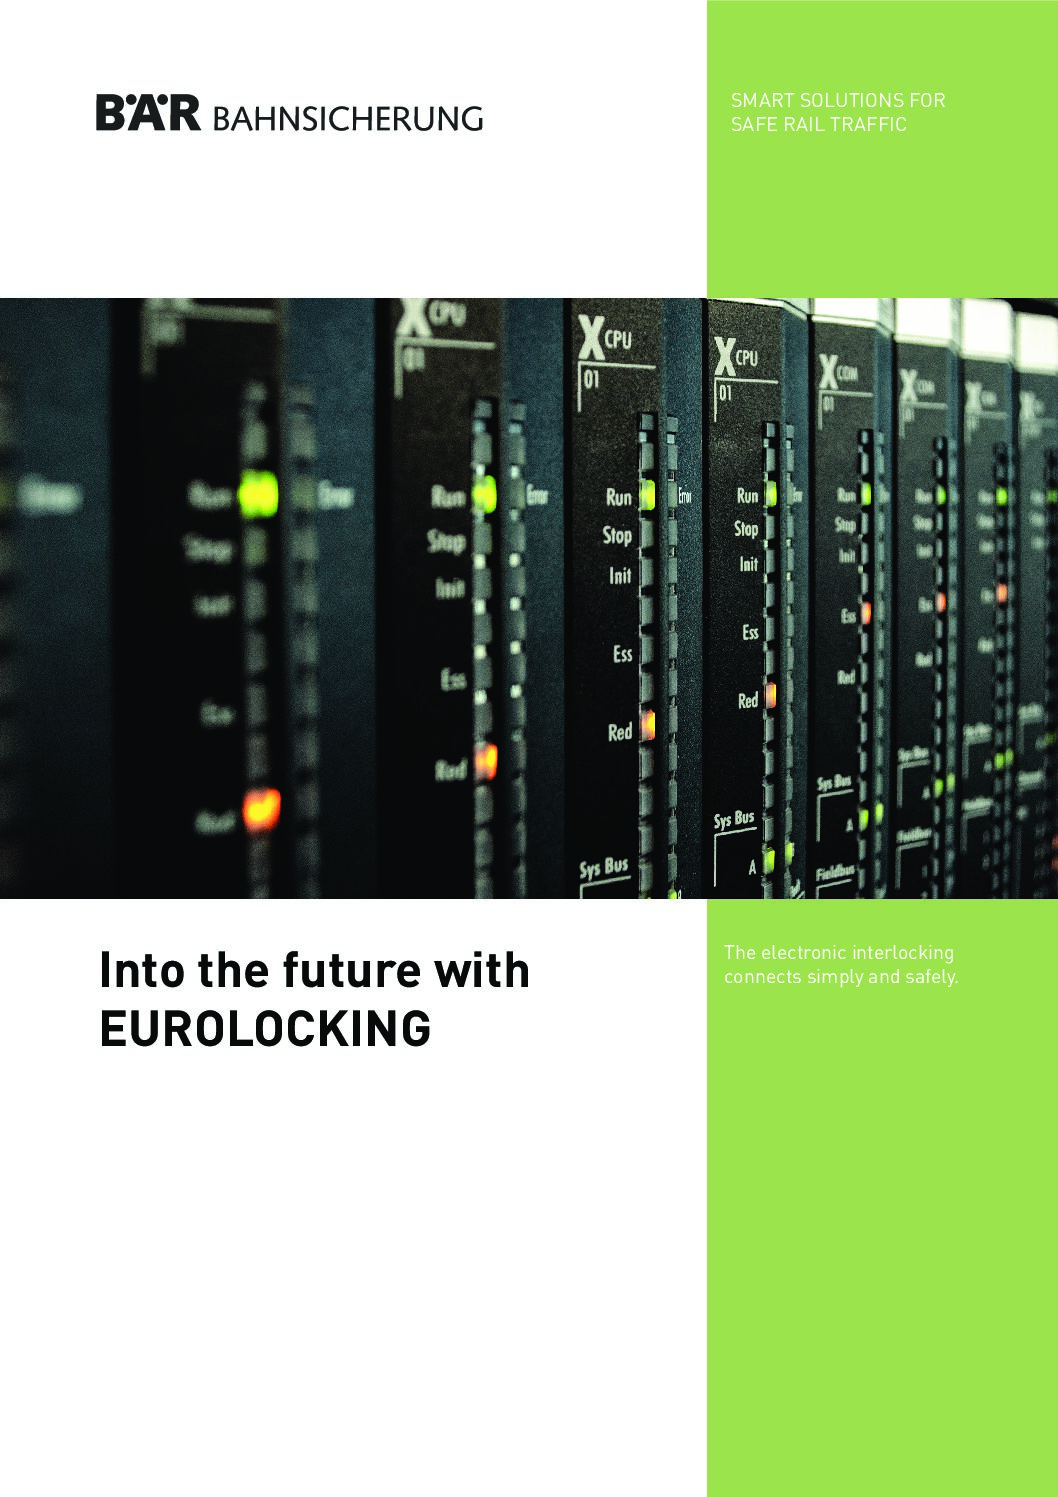 EUROLOCKING